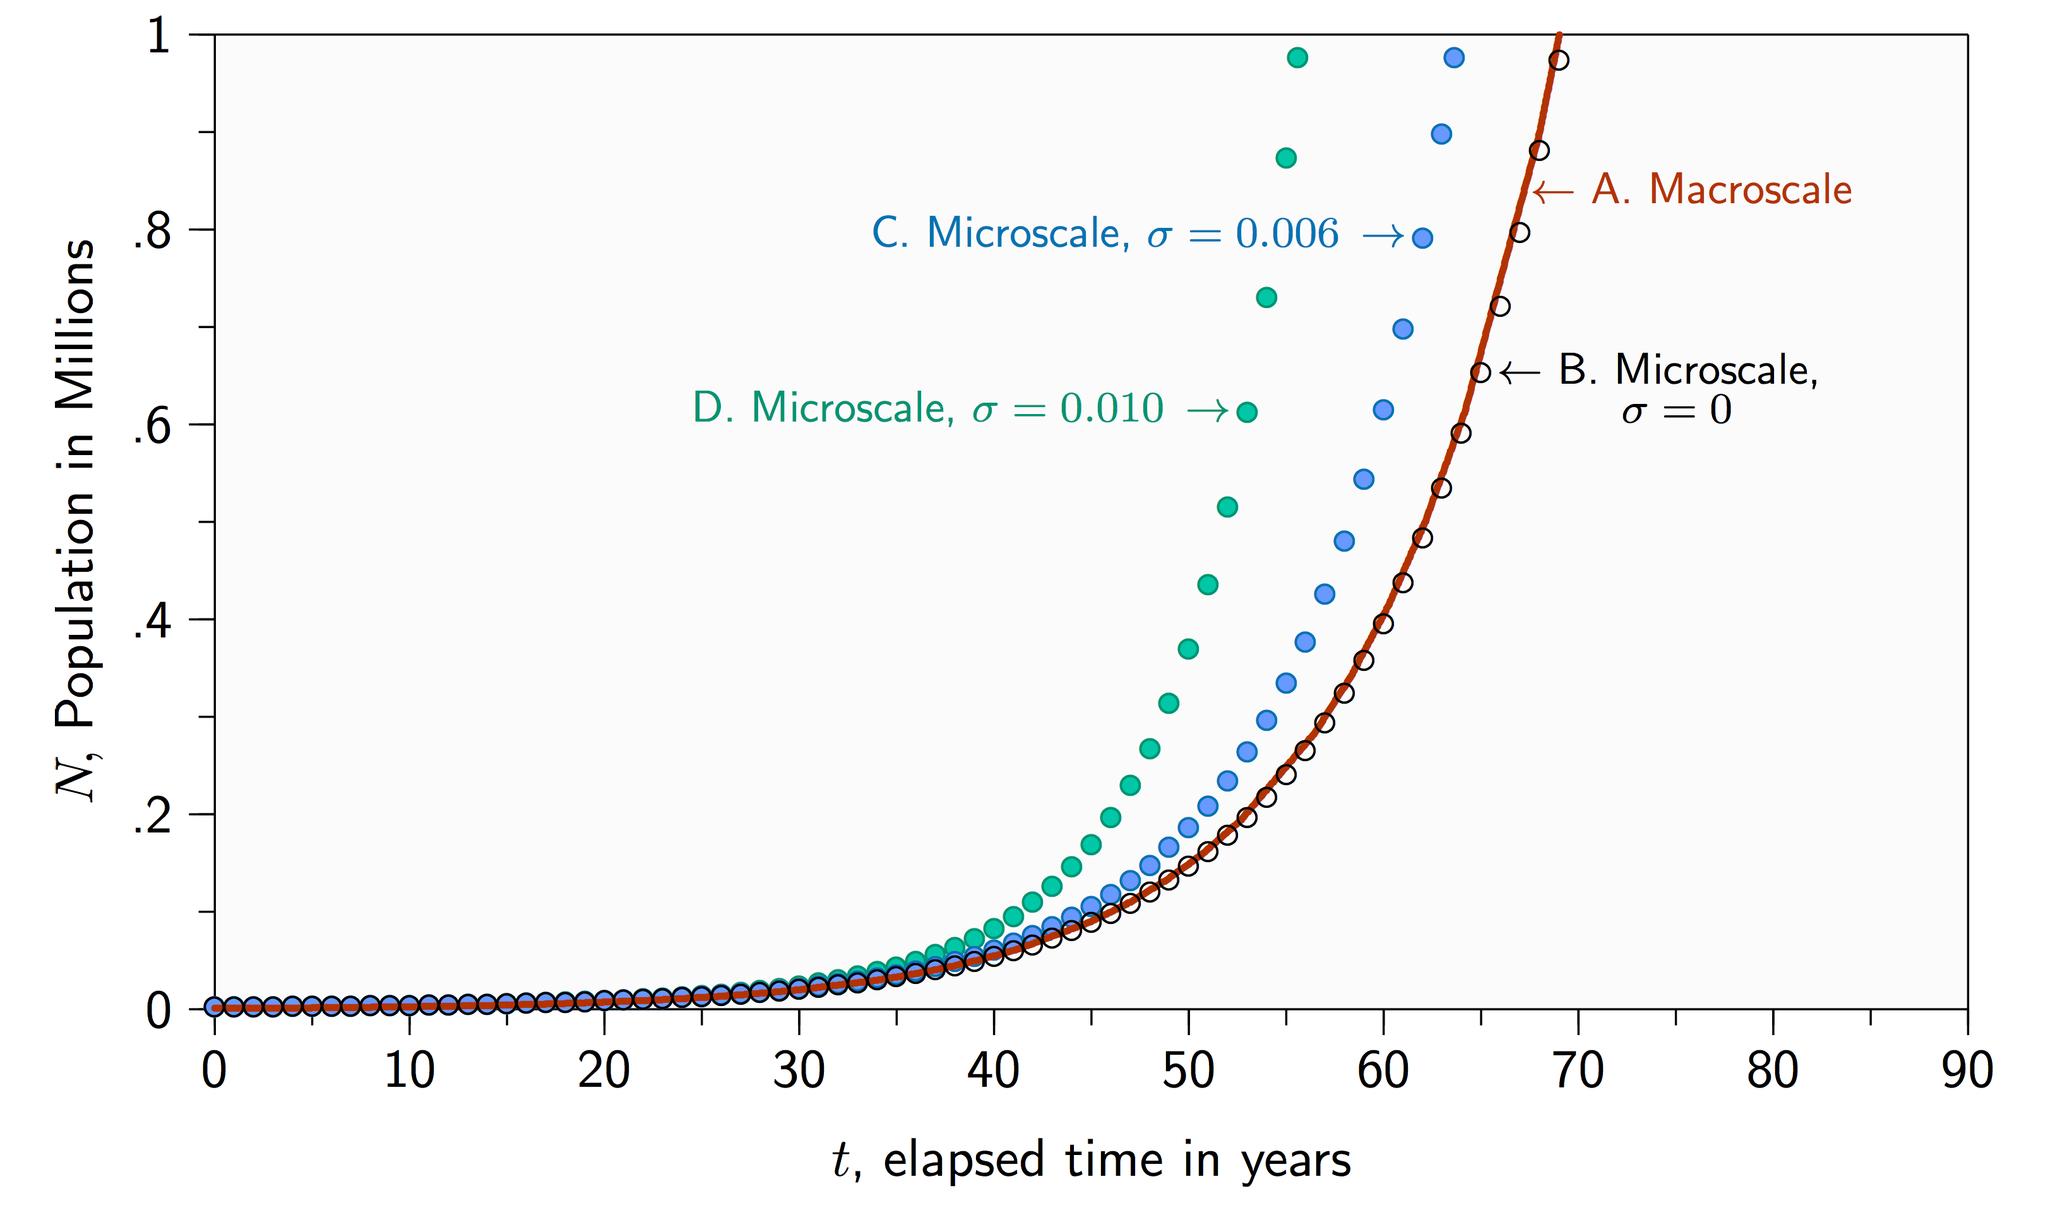 MacroscaleMicroscaleModelGraphs-ExponentialGrowth-5769372.png